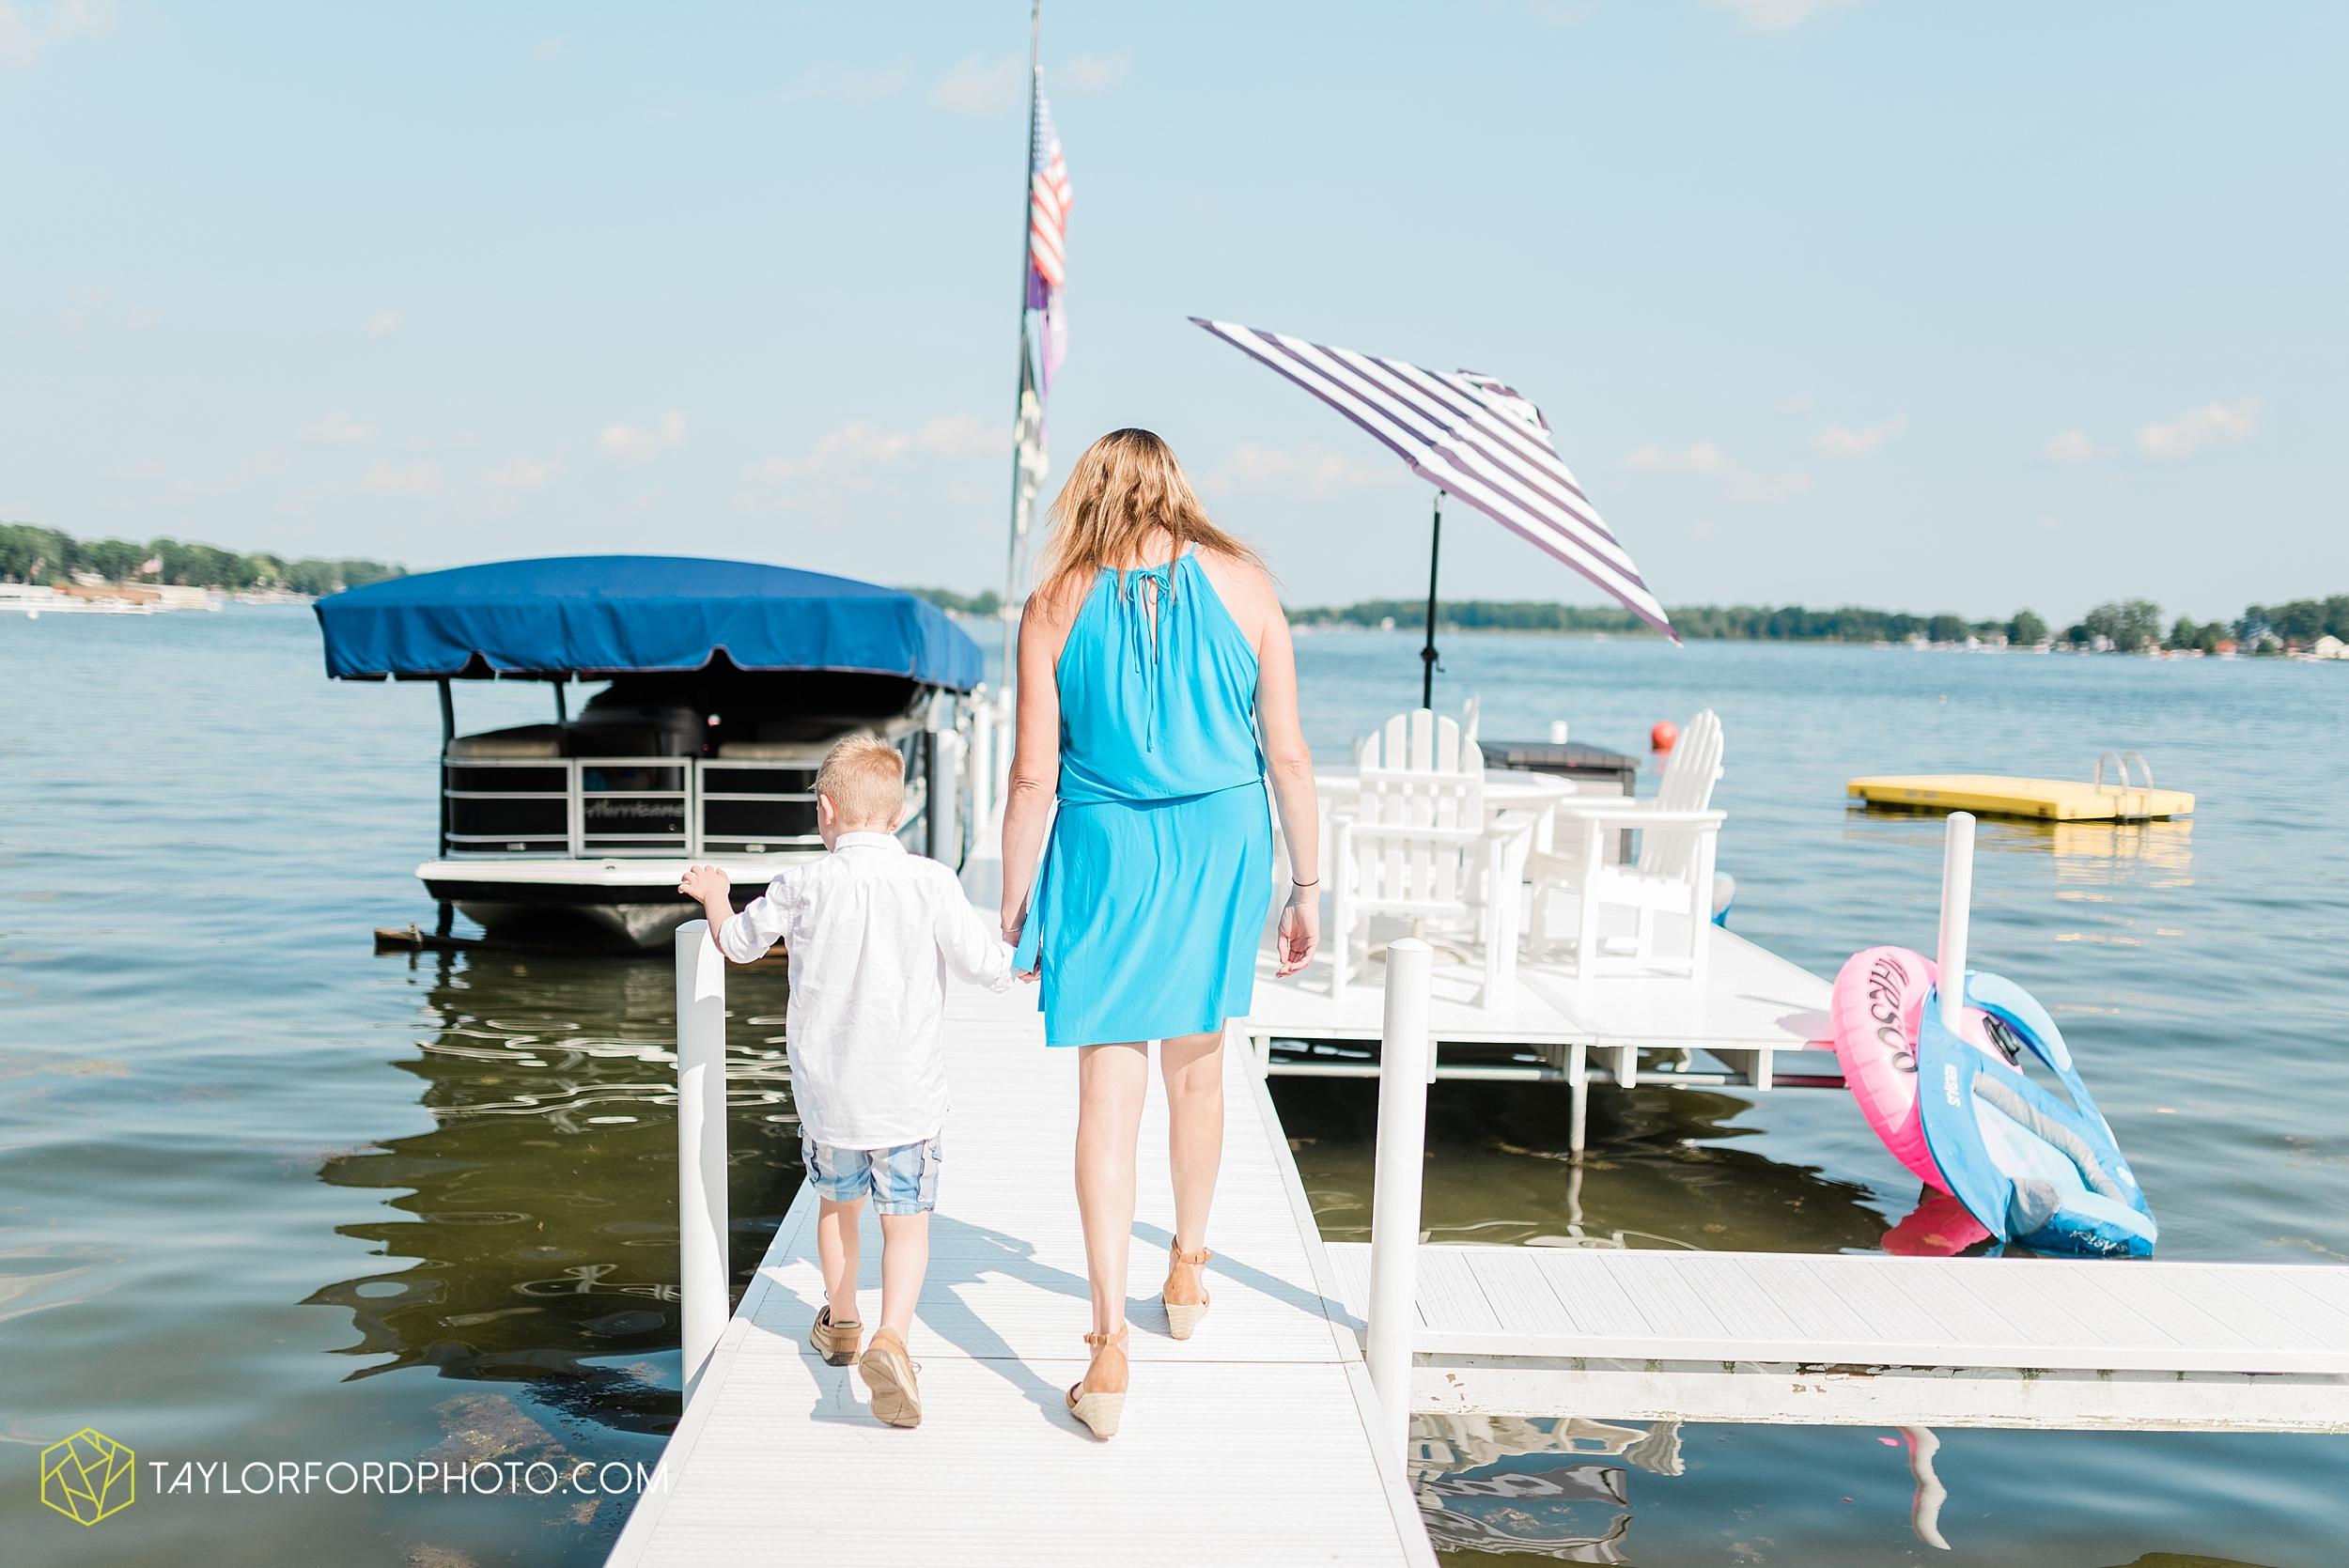 syracuse-indiana-lake-wawasee-family-lake-house-lakeside-park-lifestyle-photographer-taylor-ford-photographer_9443.jpg